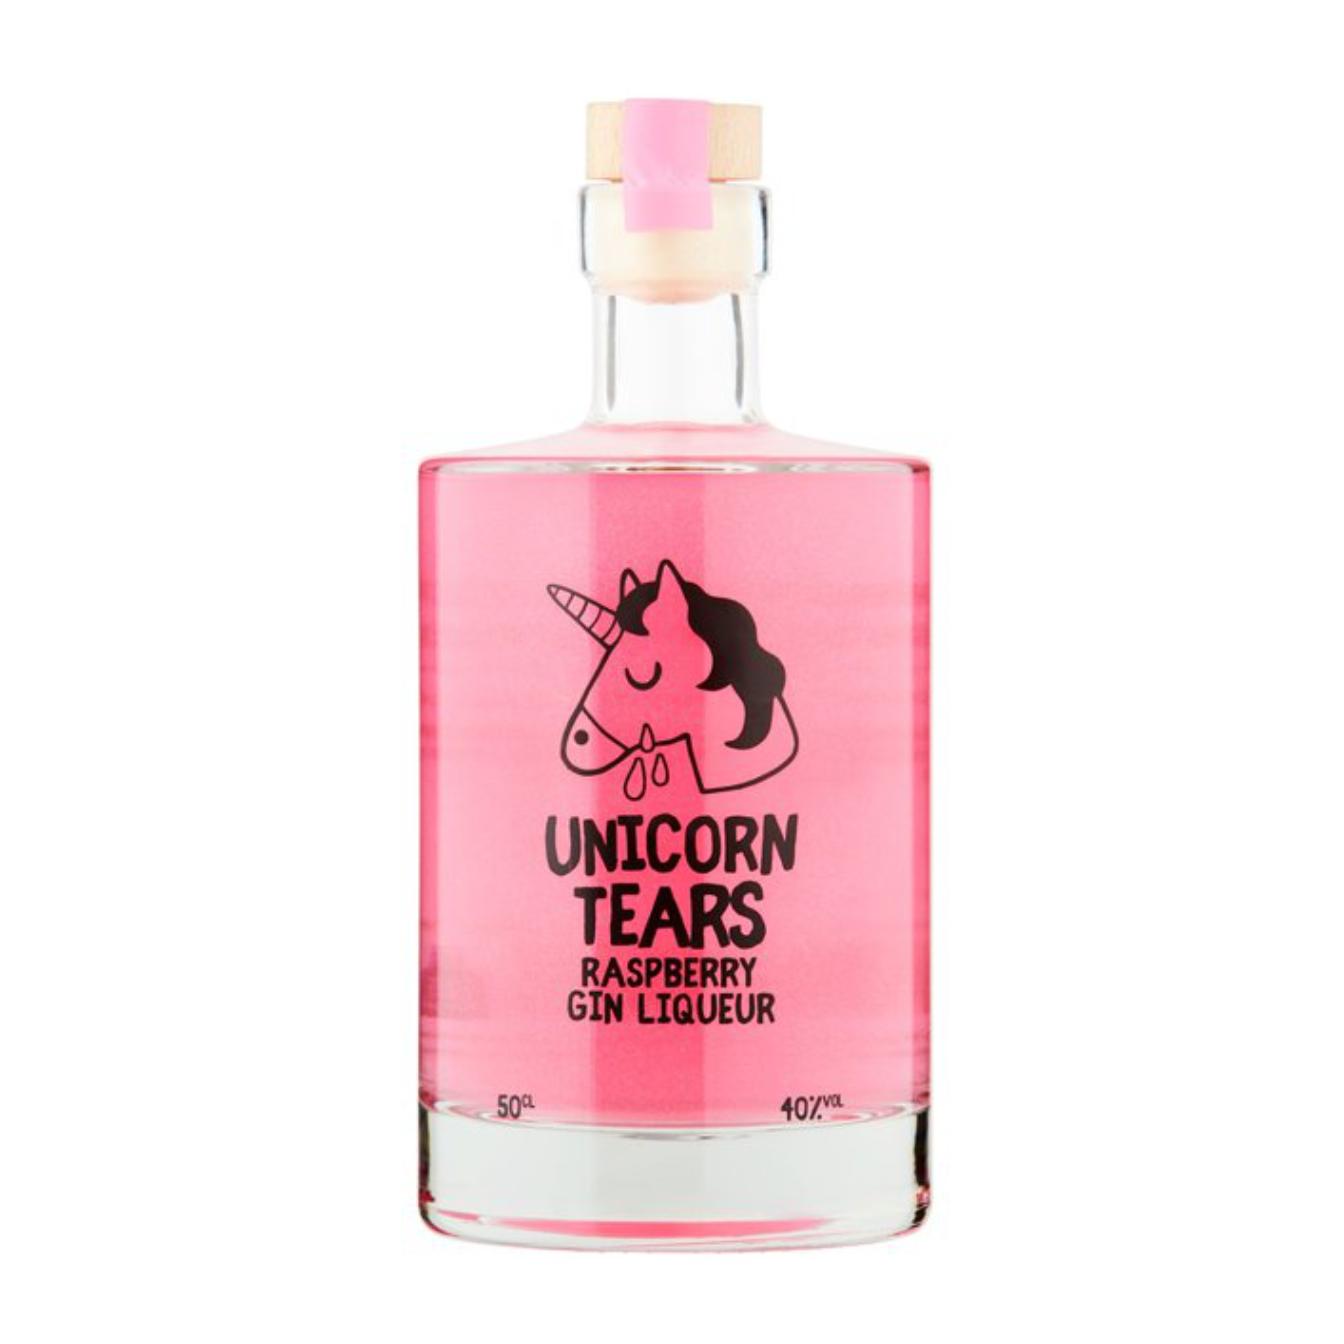 Unicorn Tears Raspberry Gin Liqueur